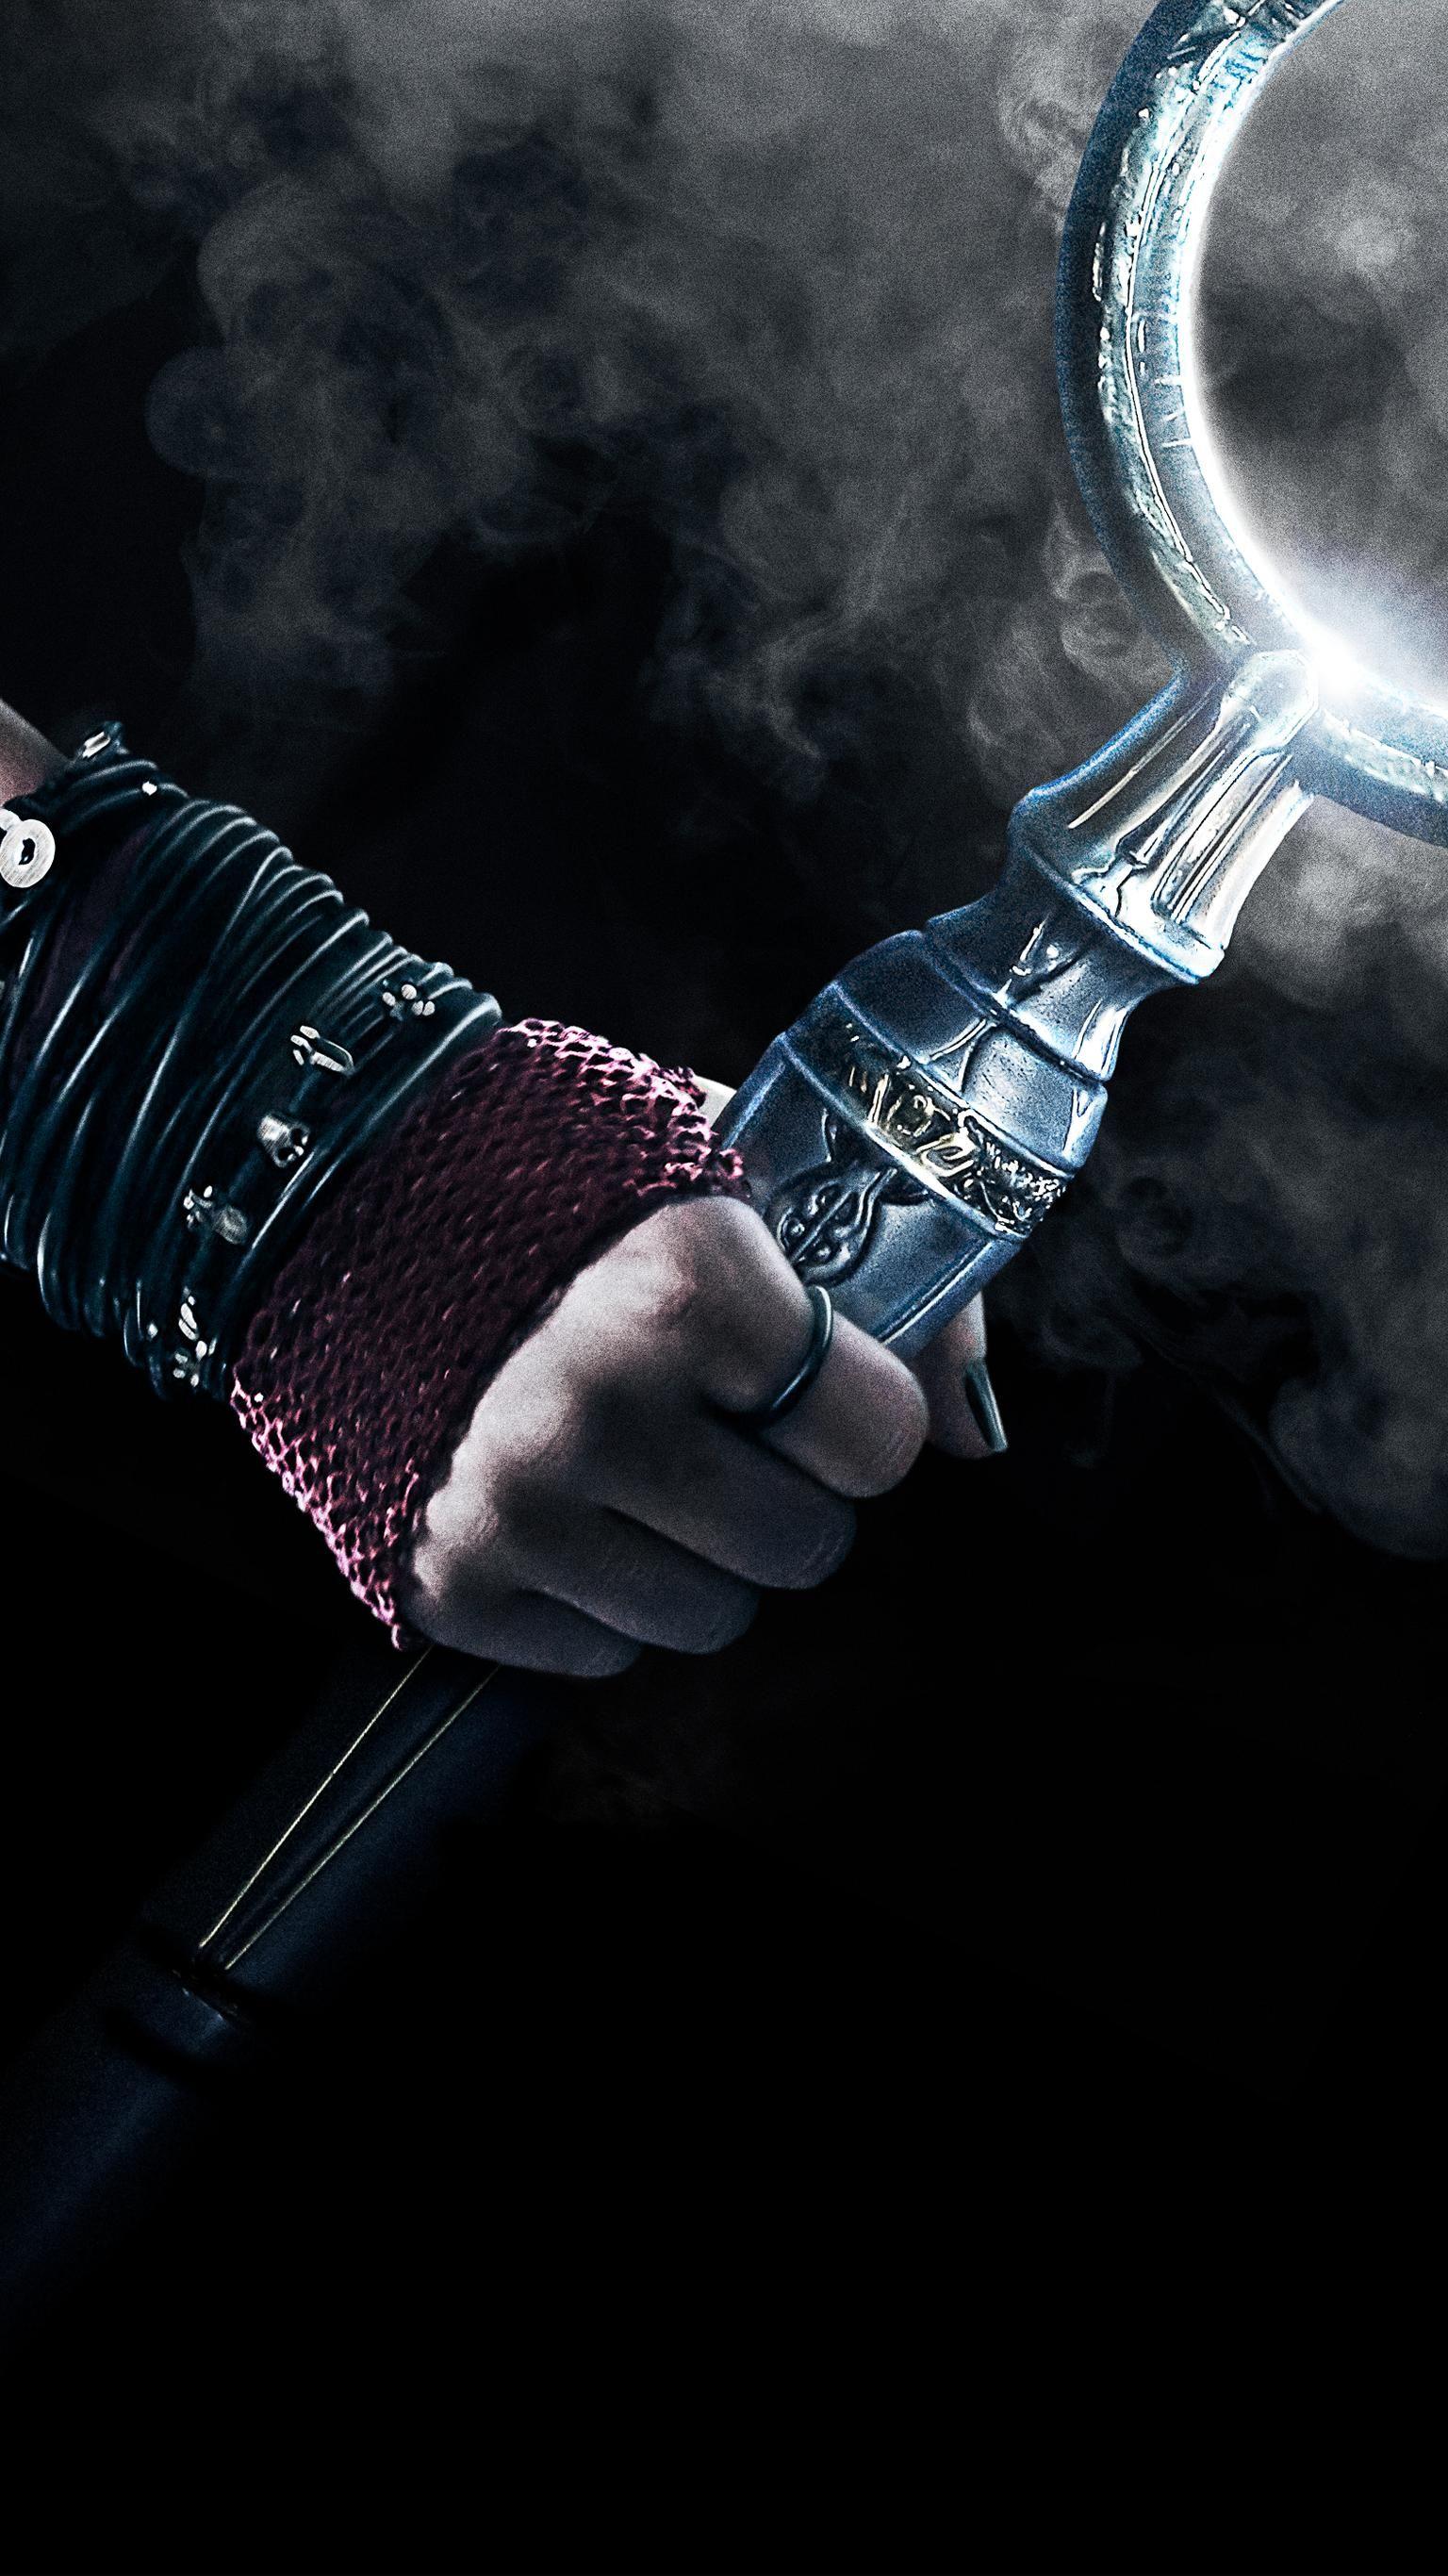 Marvel S Runaways Phone Wallpaper En 2020 Dessin Sorciere Dessin Fond Ecran